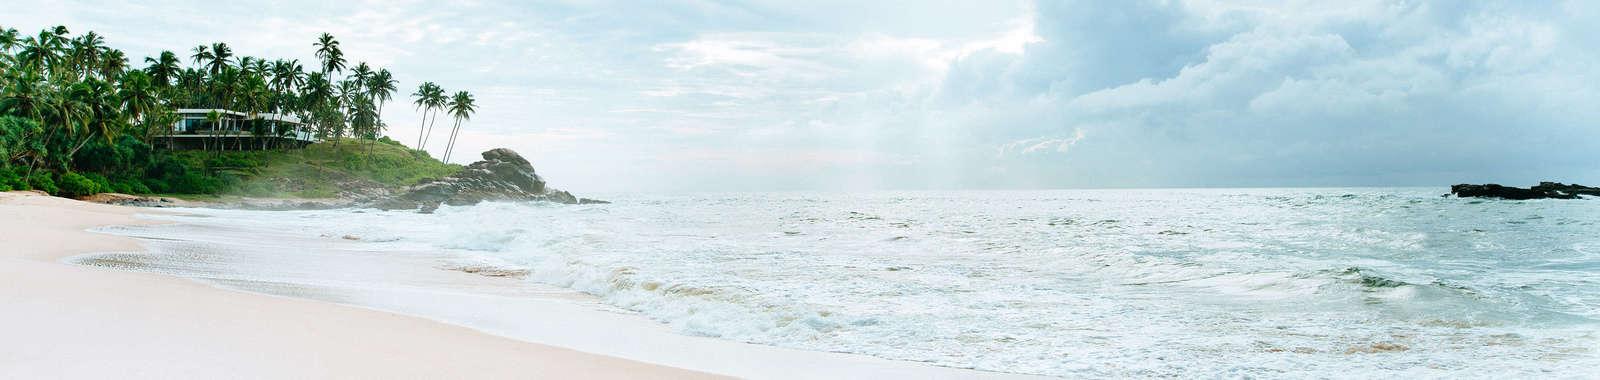 Hi_ATAN_69483377_ATAN_Beach_Il_Mare_Day_01_G_A_L